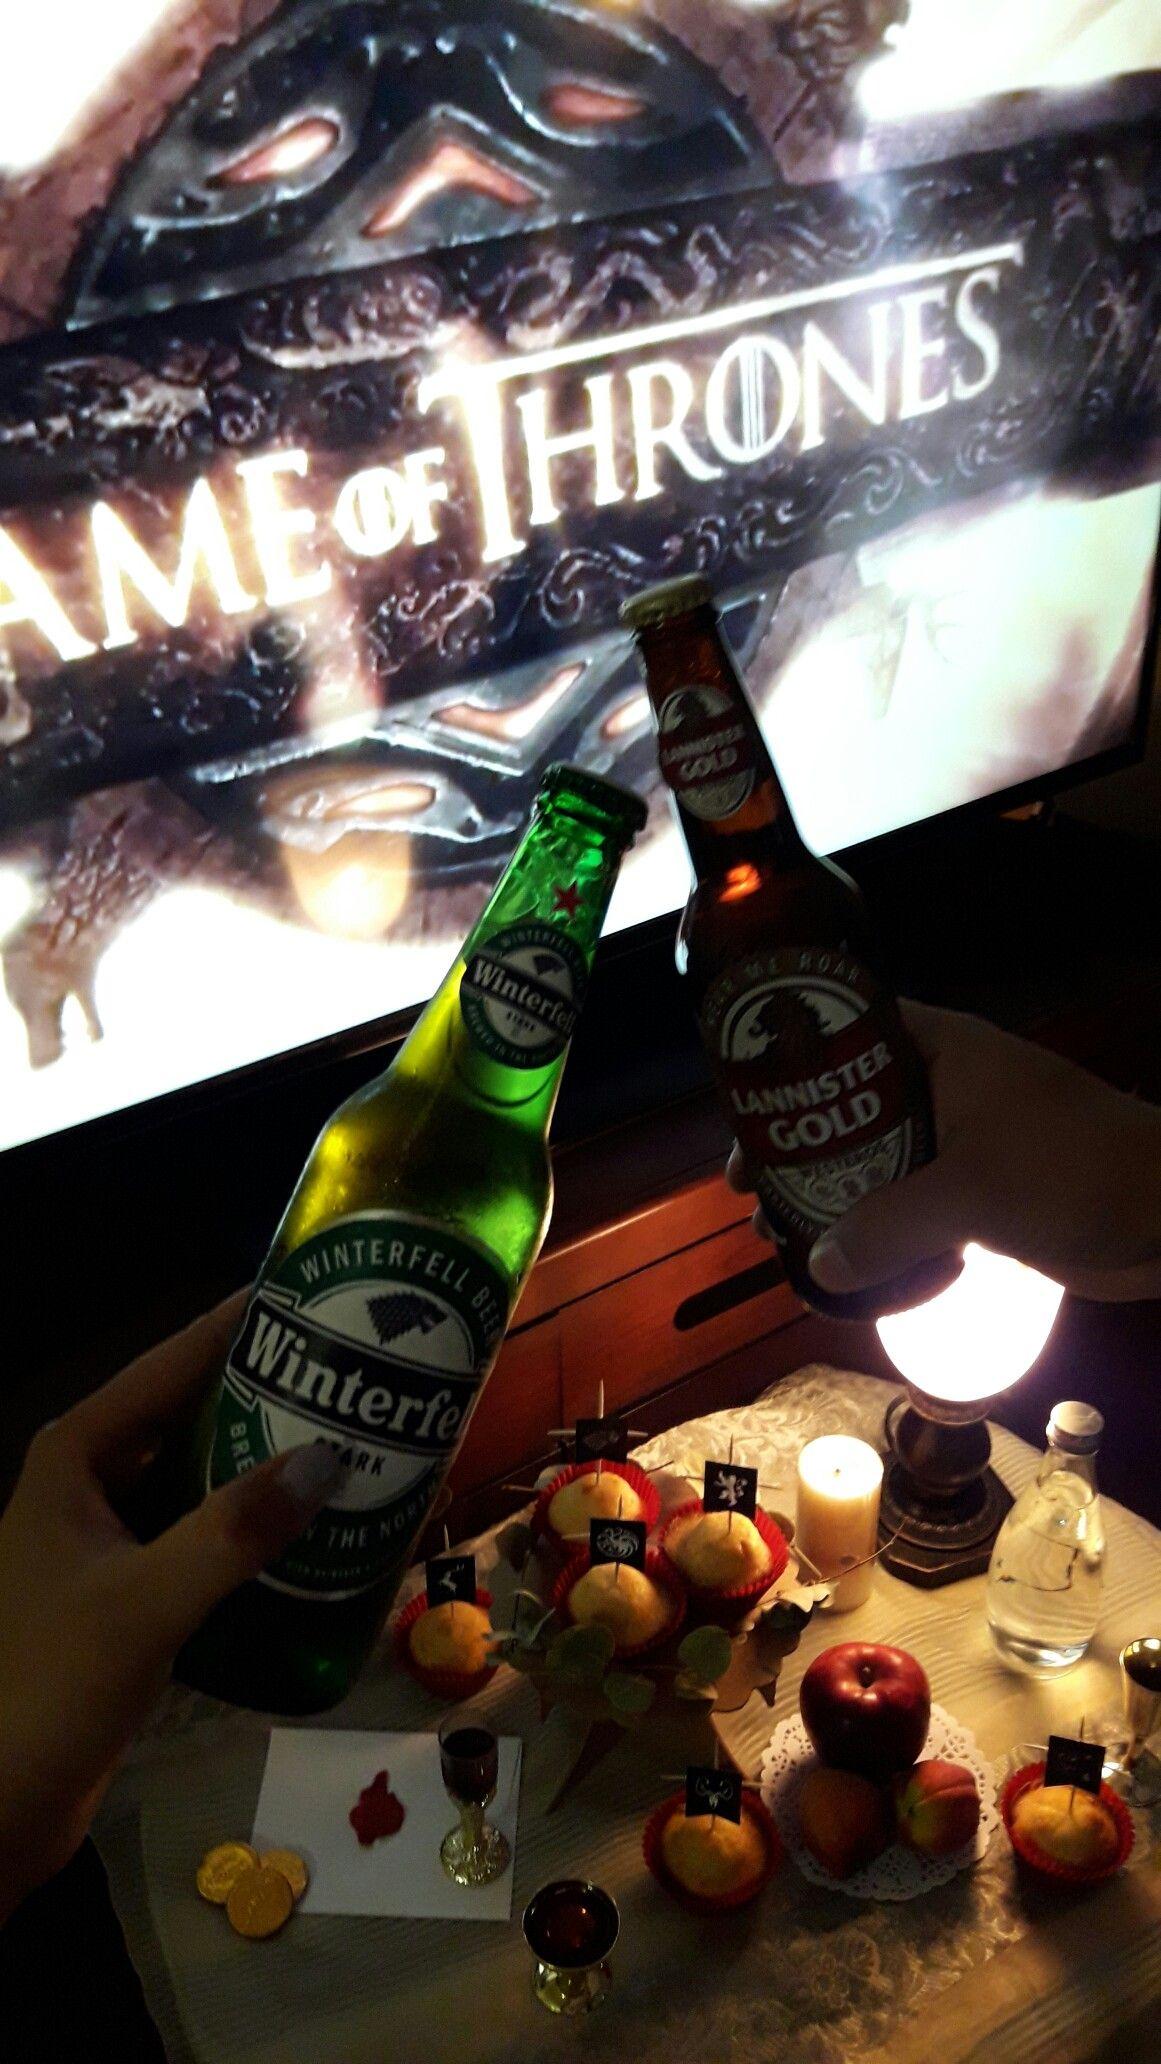 Game of thrones party! got winterishere beer